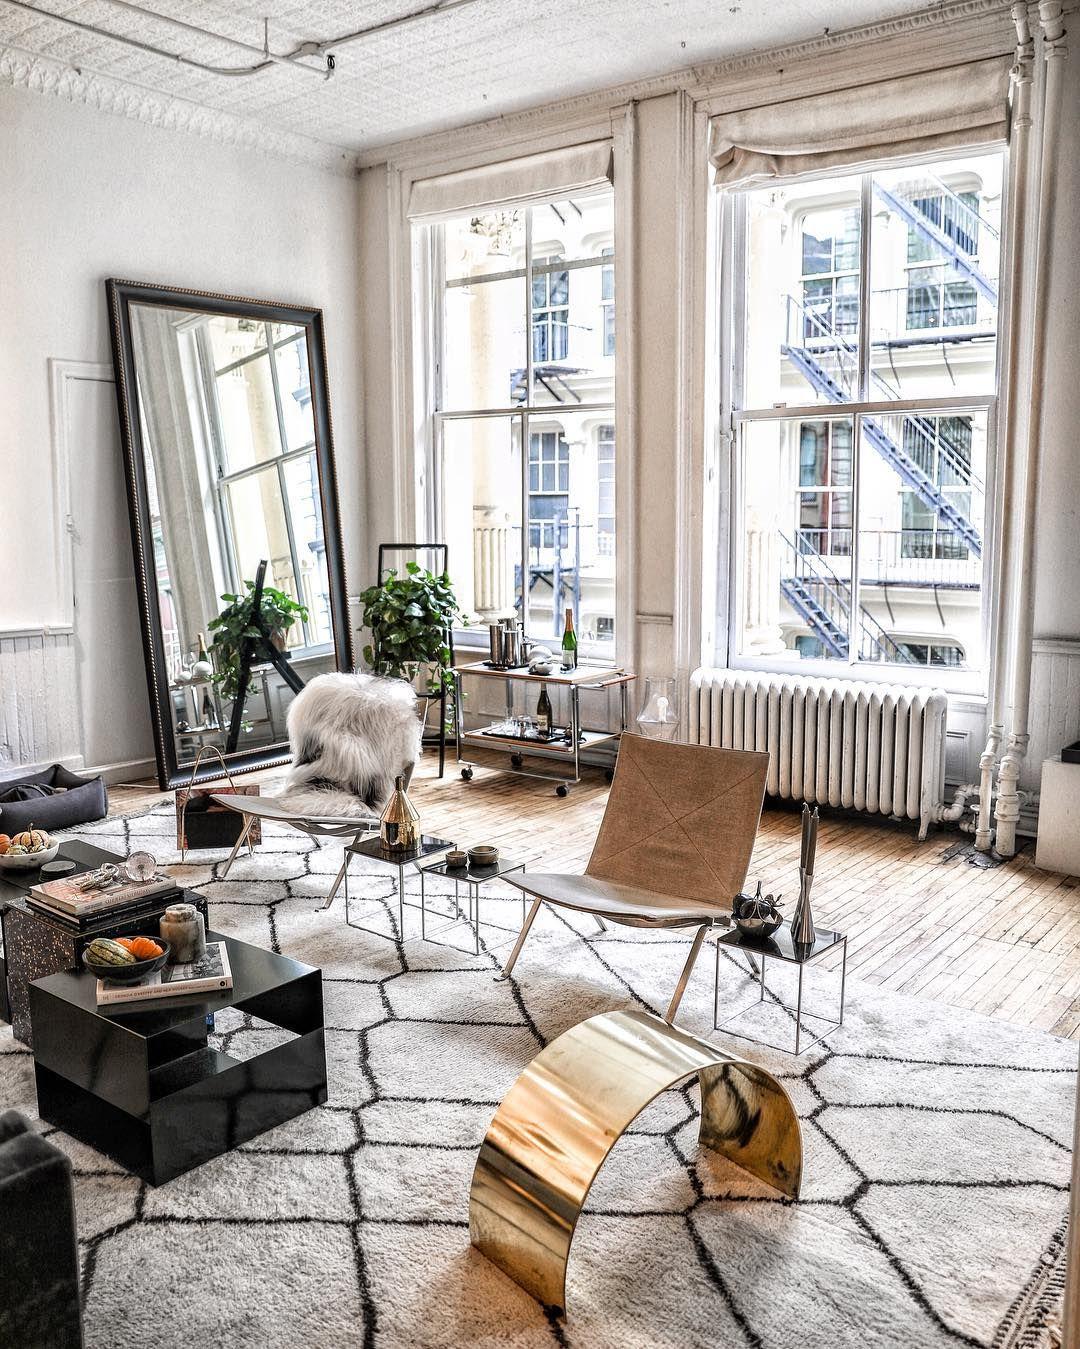 The line interior design pinterest mid century living room